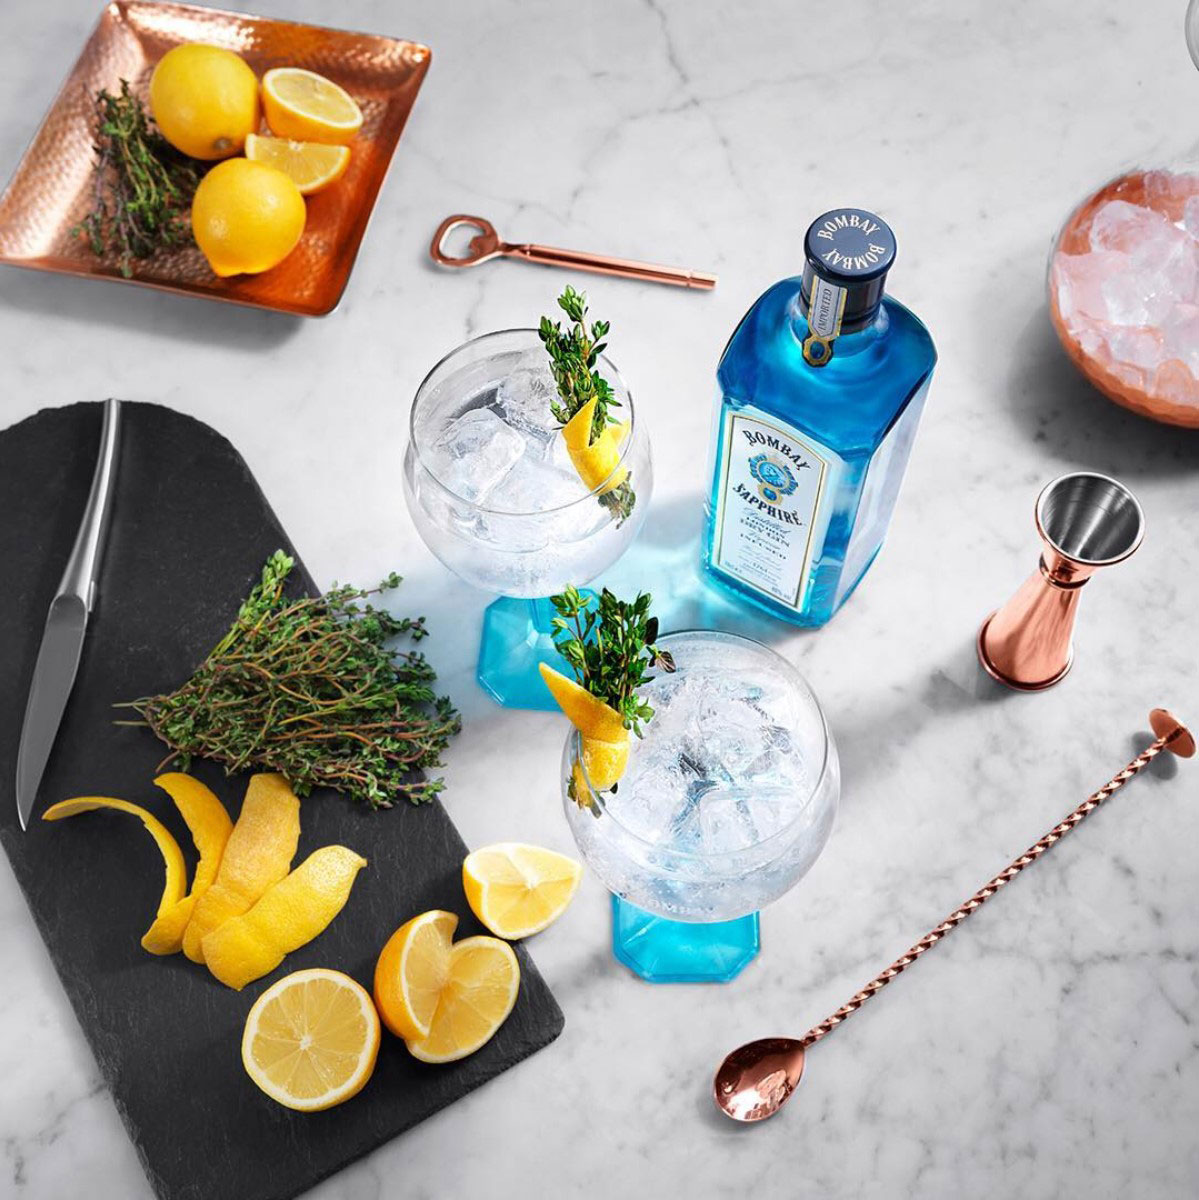 4-Bombay---Lemon-&-thyme